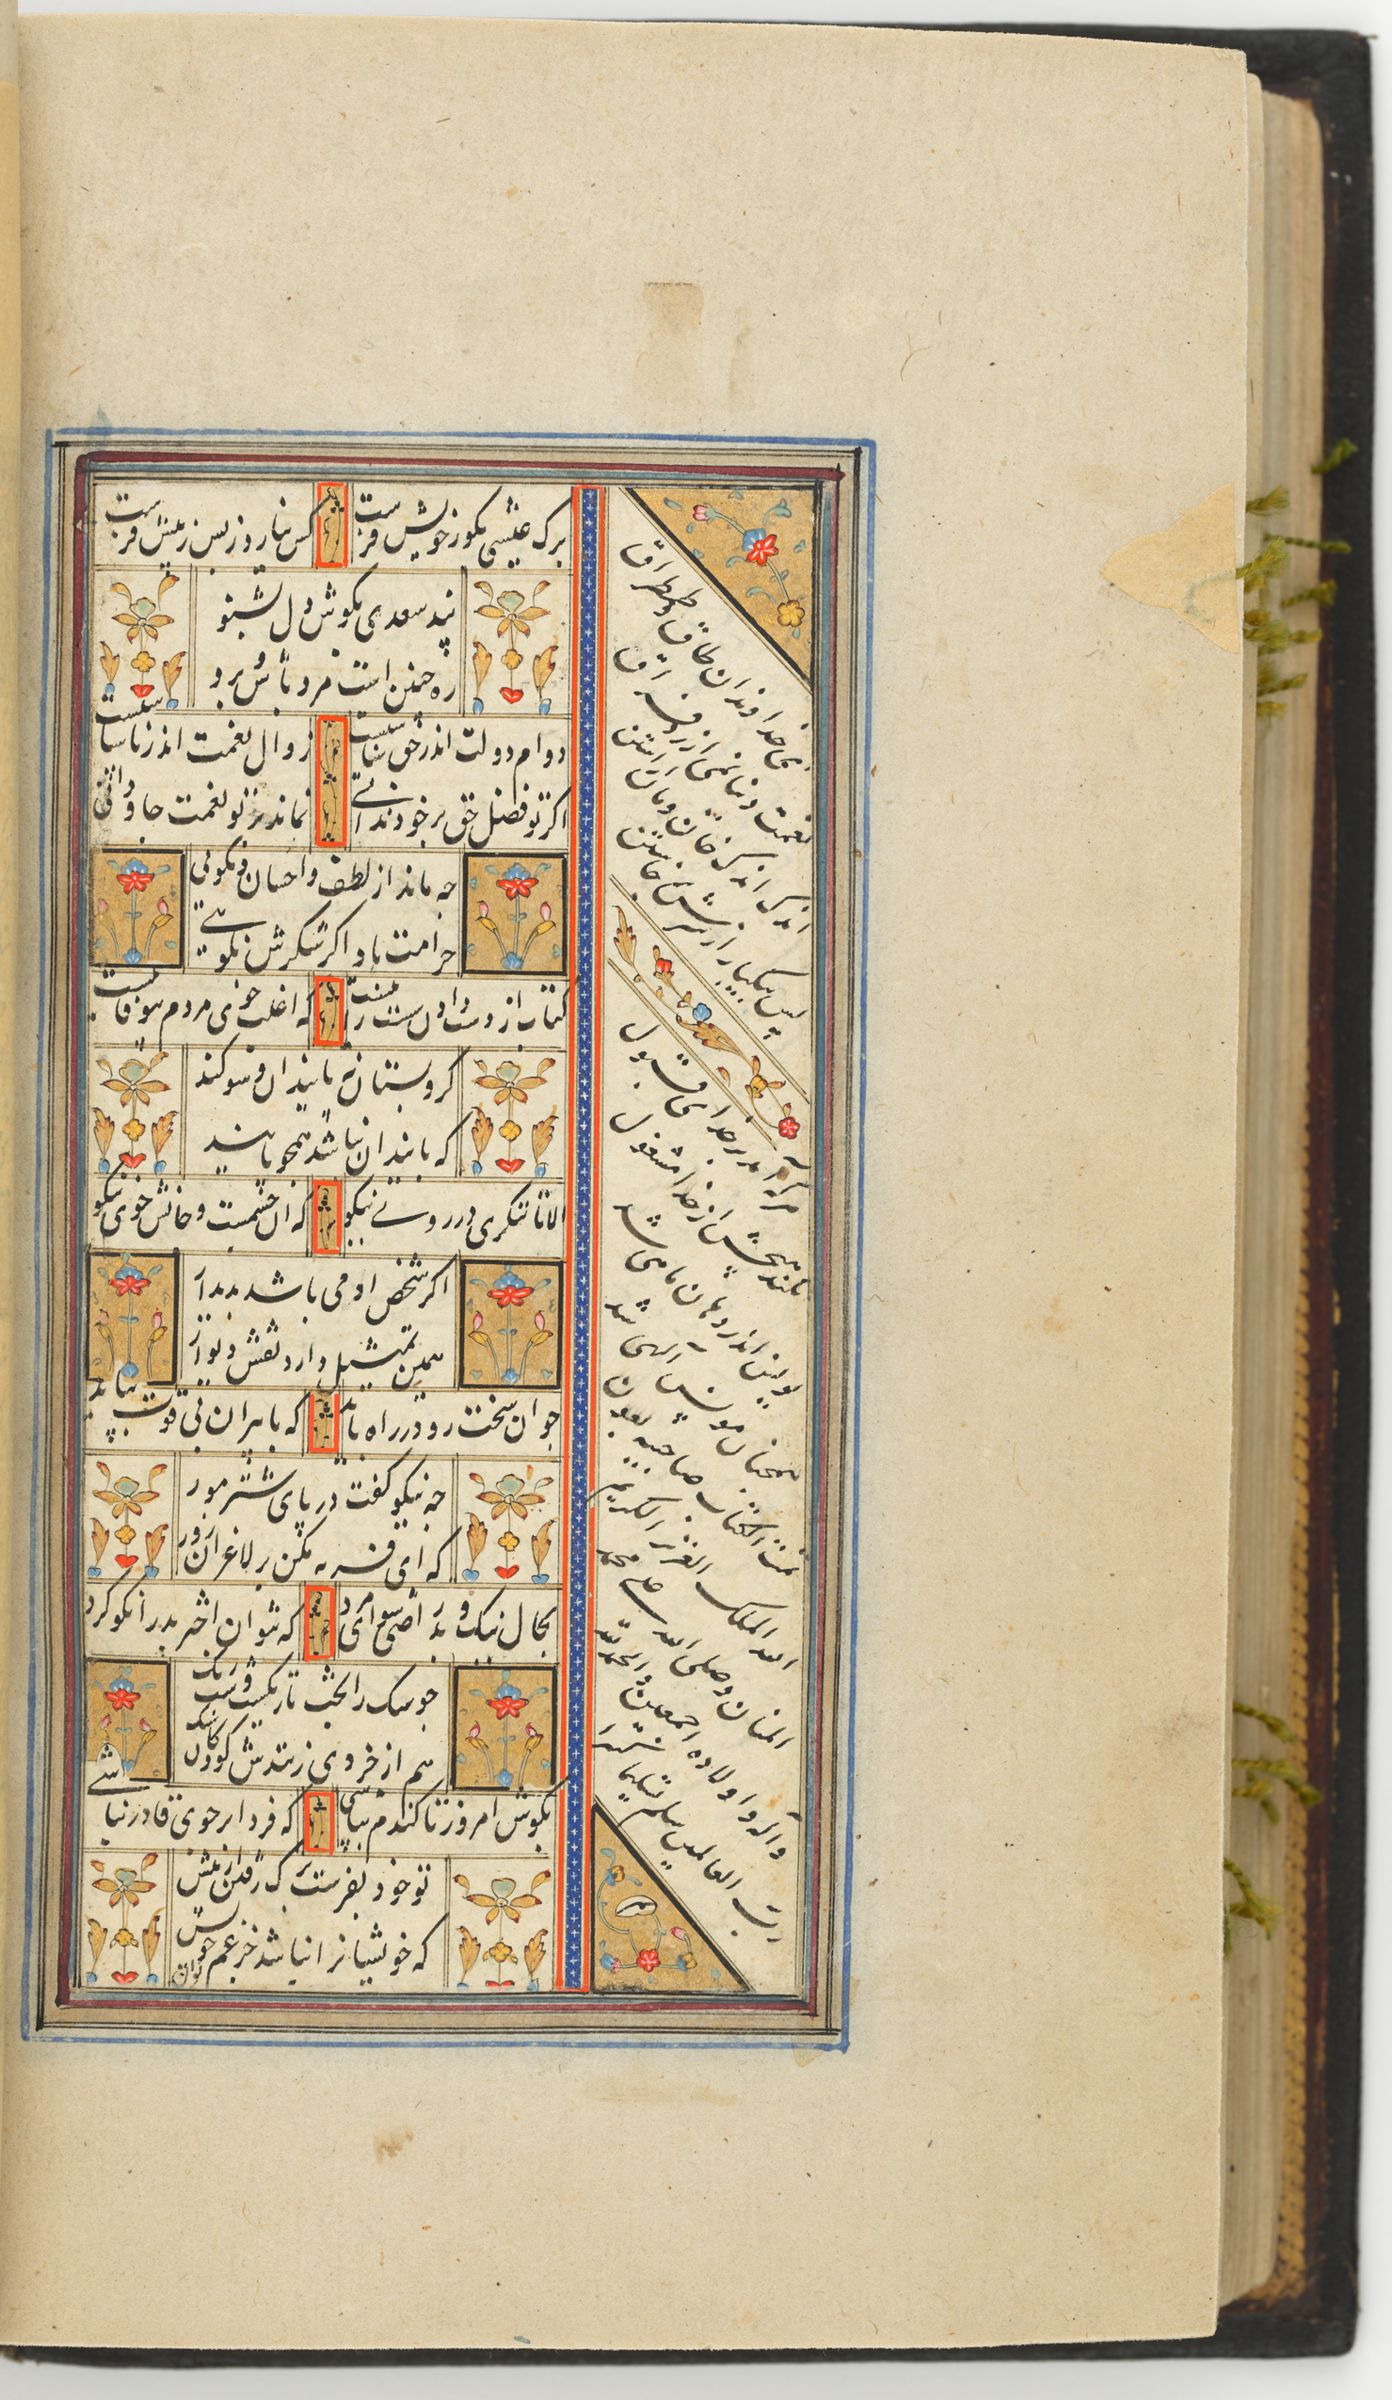 Text Folio (Text Recto; Text Verso Of Folio 328), From A Manuscript Of The Kulliyat Of Sa'di